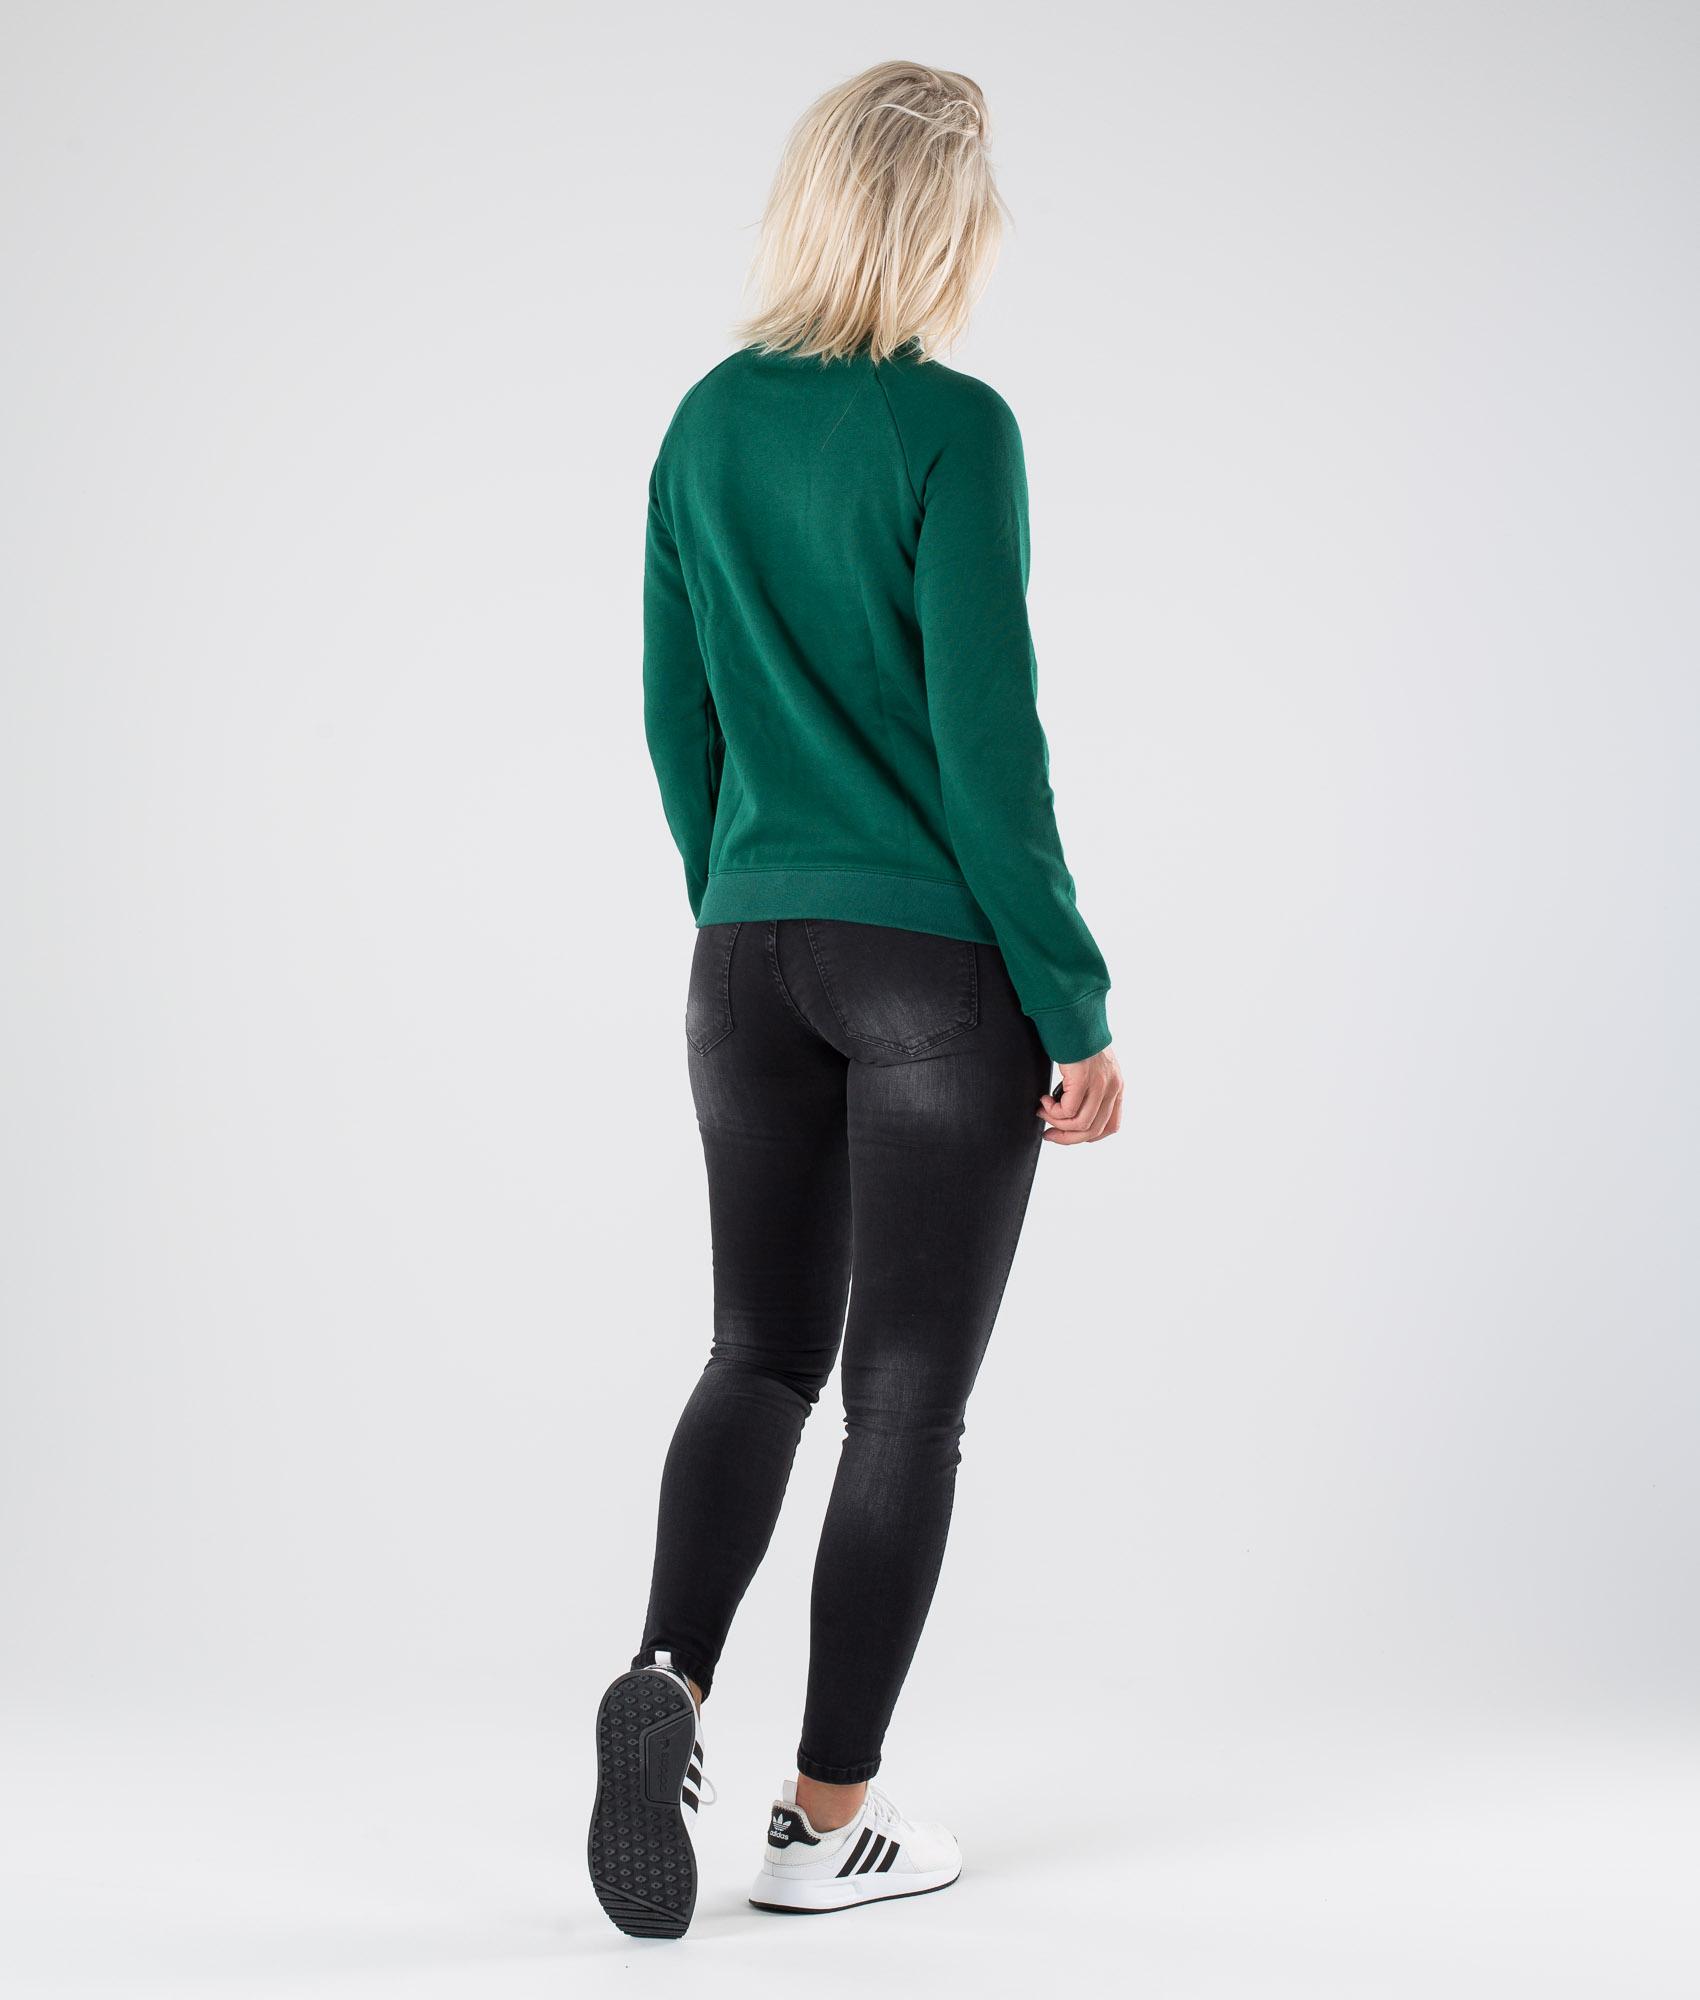 Adidas Originals Trefoil Sweatshirt Collegiate Green